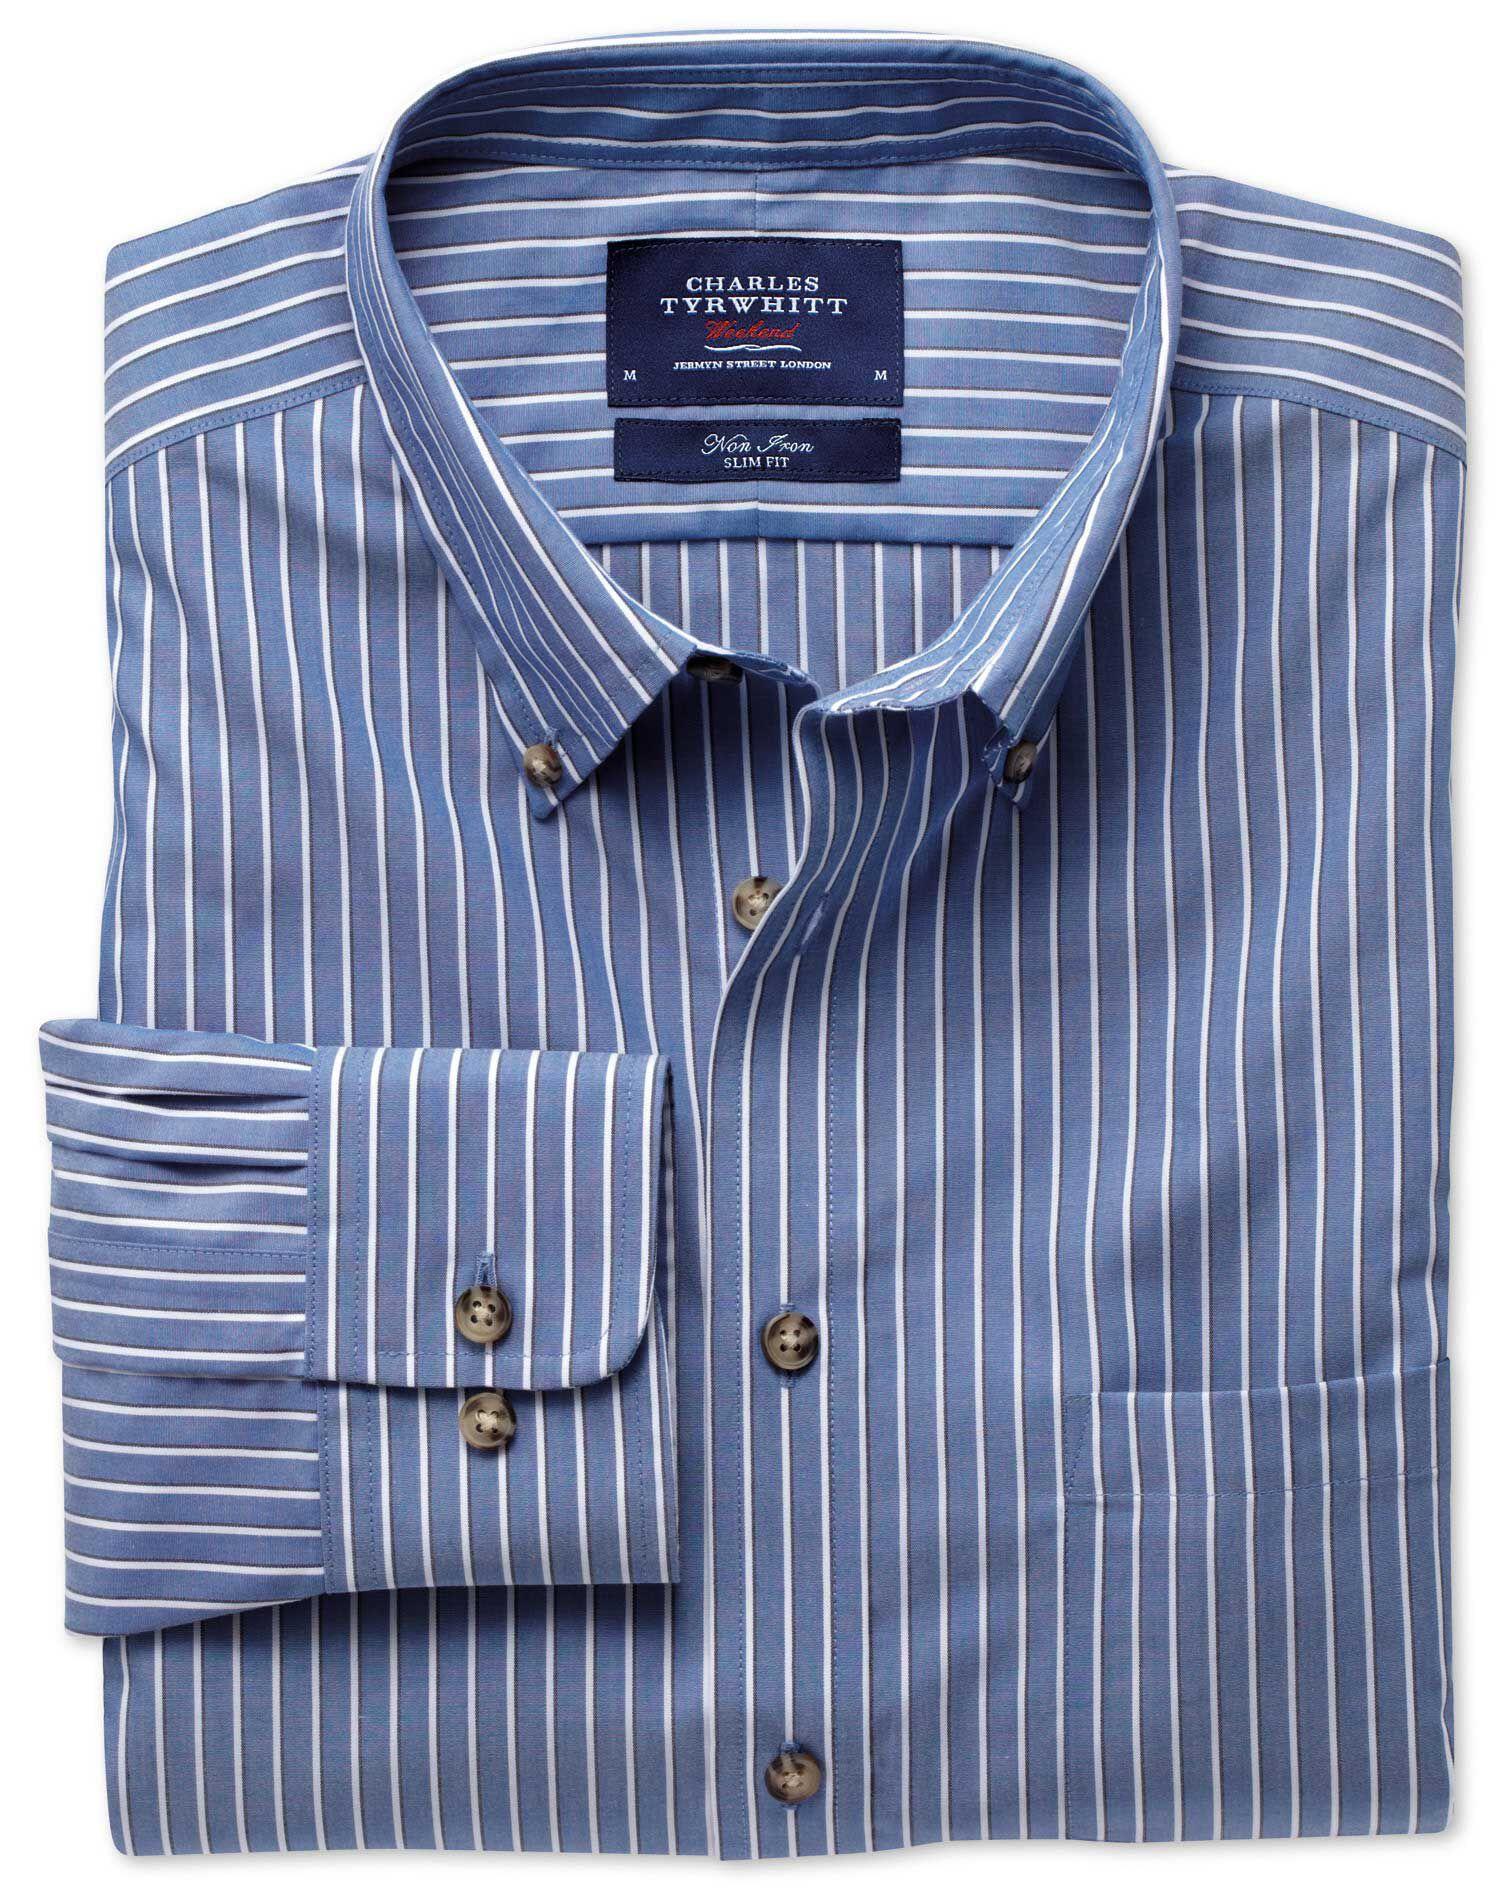 Slim Fit Non-Iron Poplin Blue and White Stripe Cotton Shirt Single Cuff Size XS by Charles Tyrwhitt